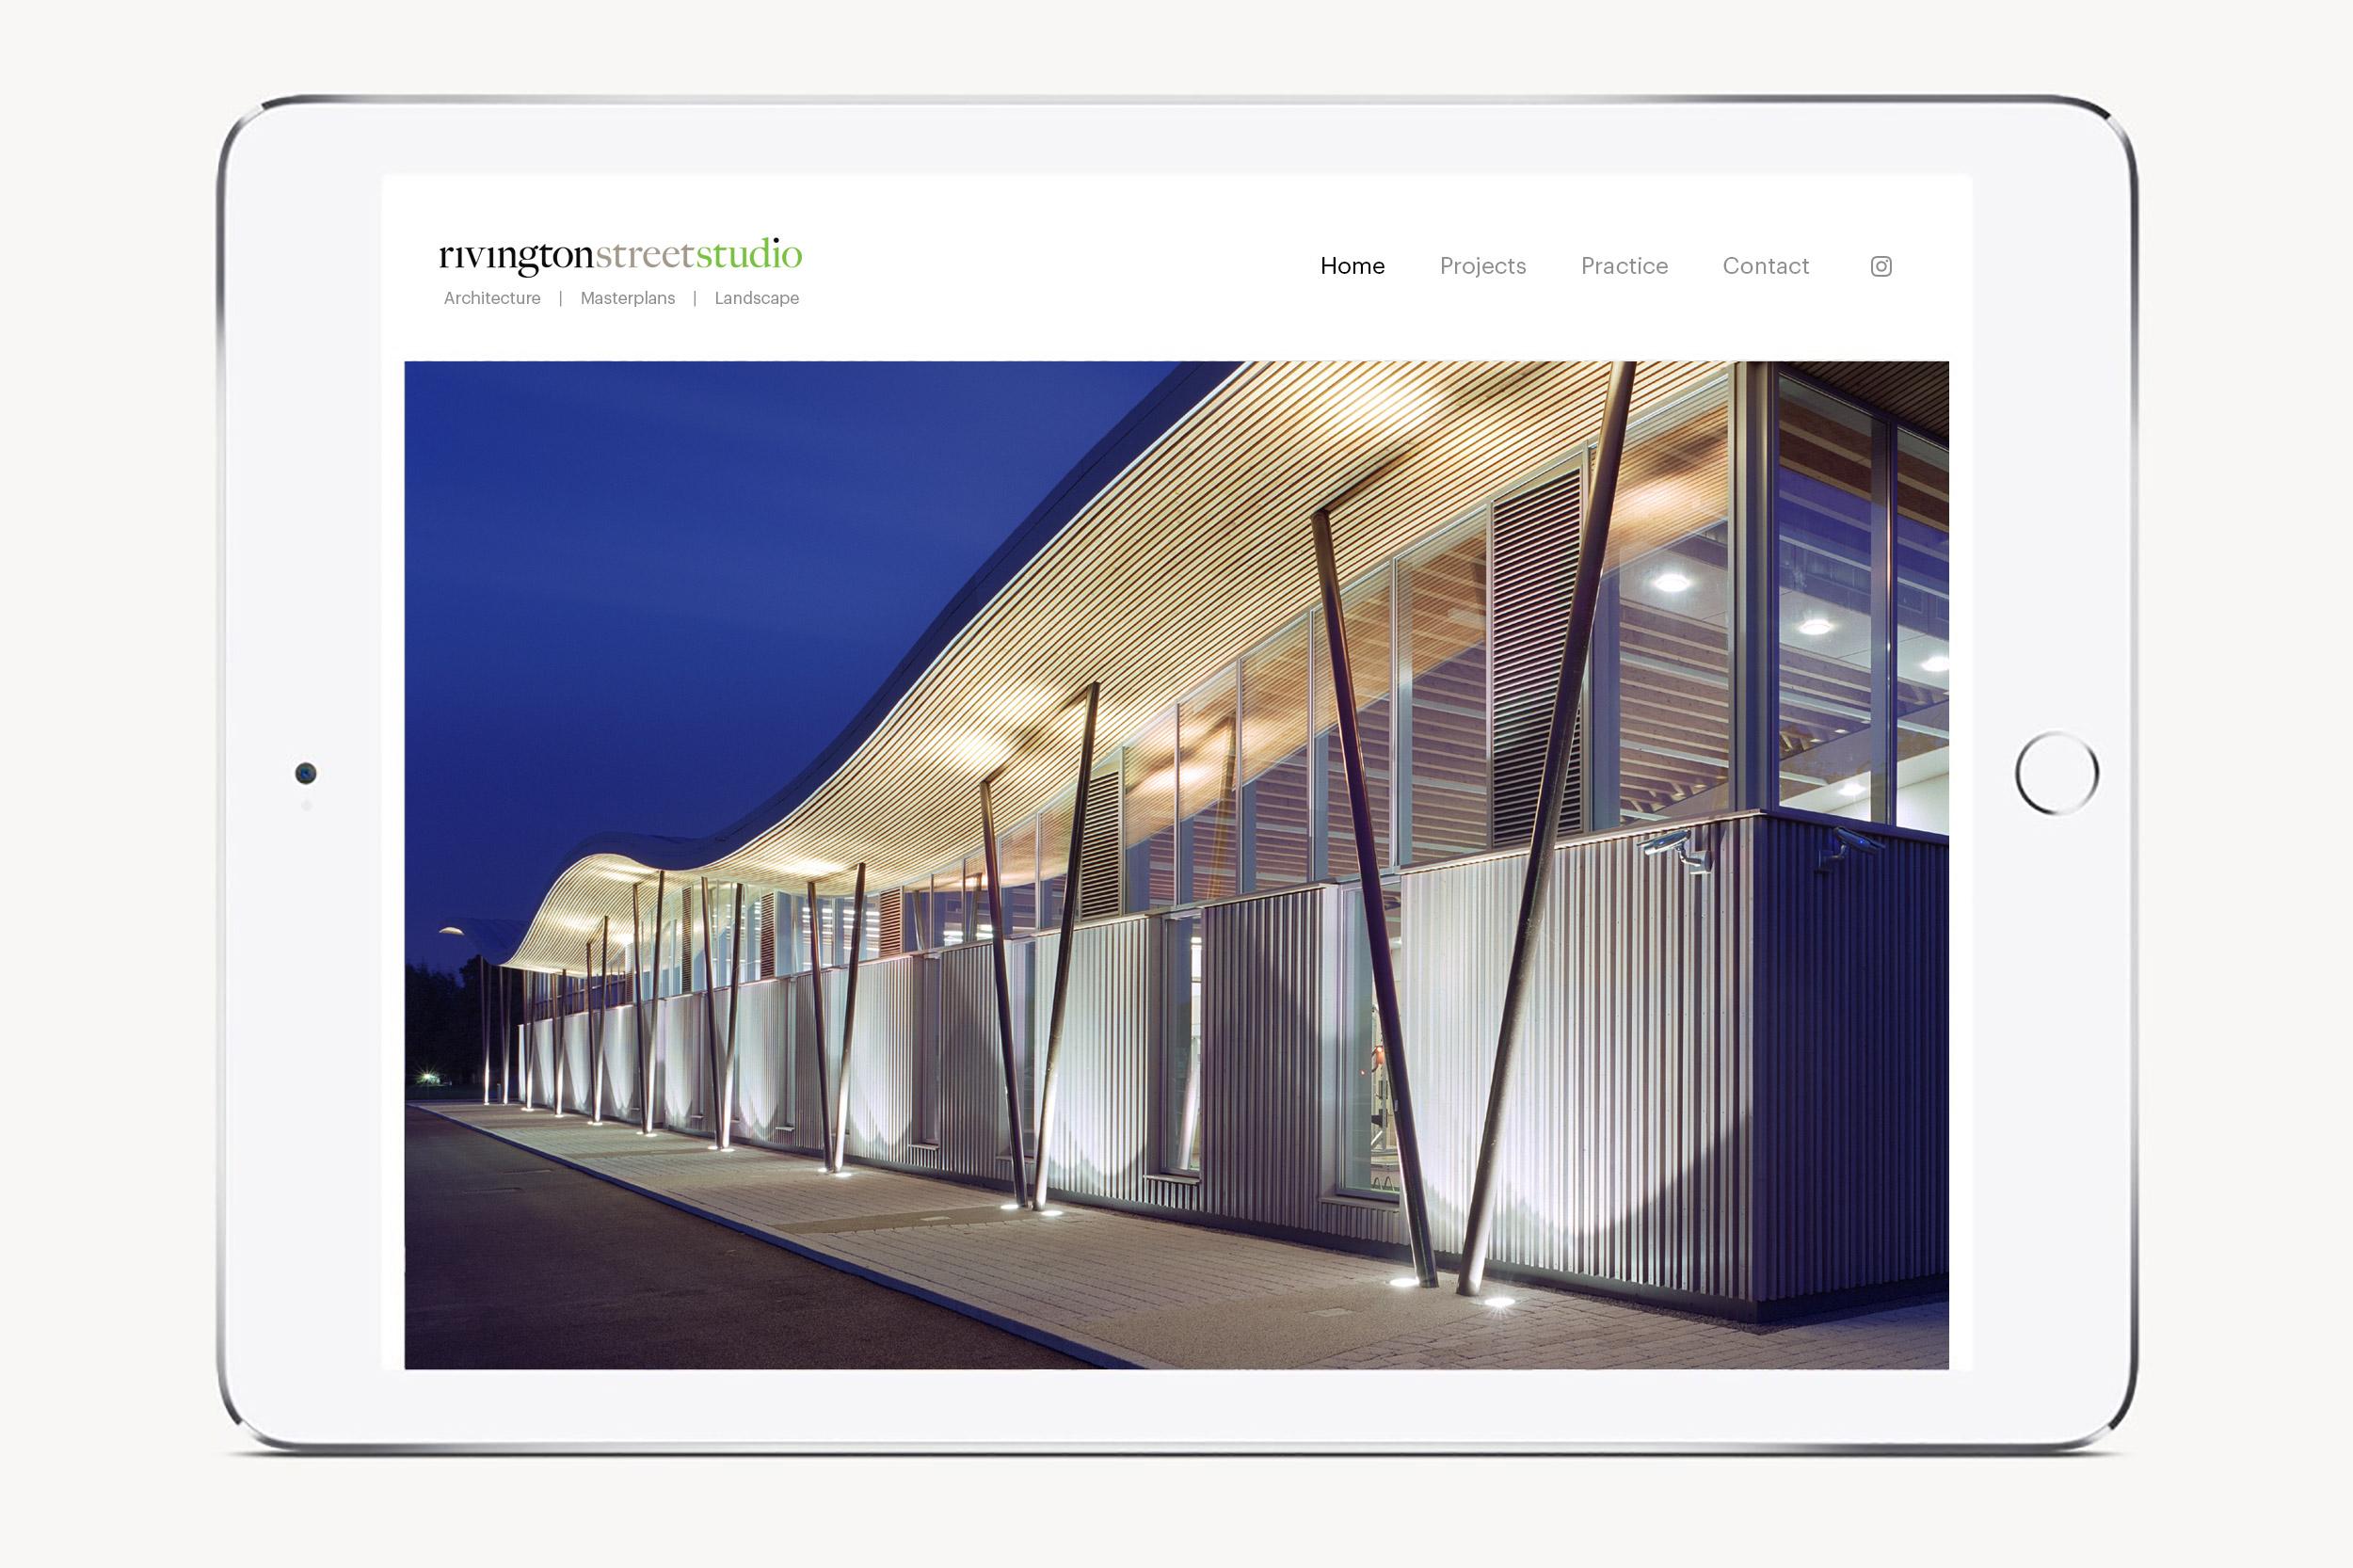 Rivington Street Studio Architects